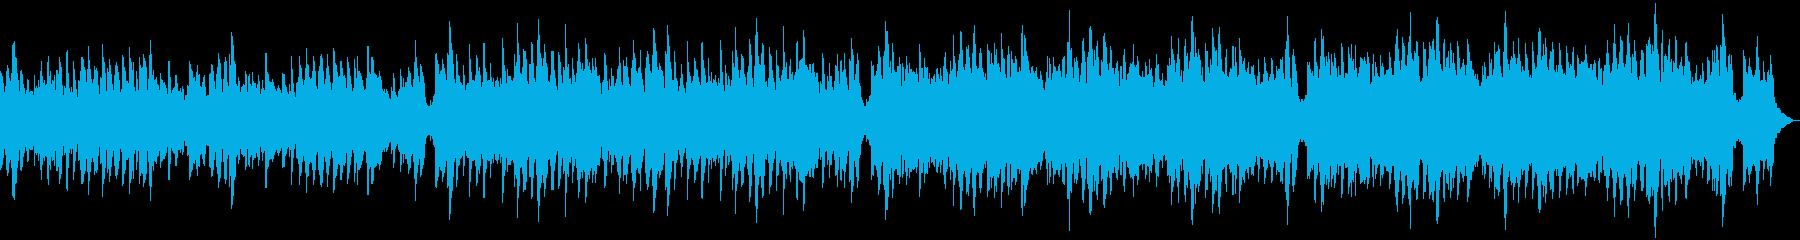 Piano Arpeggiosの再生済みの波形